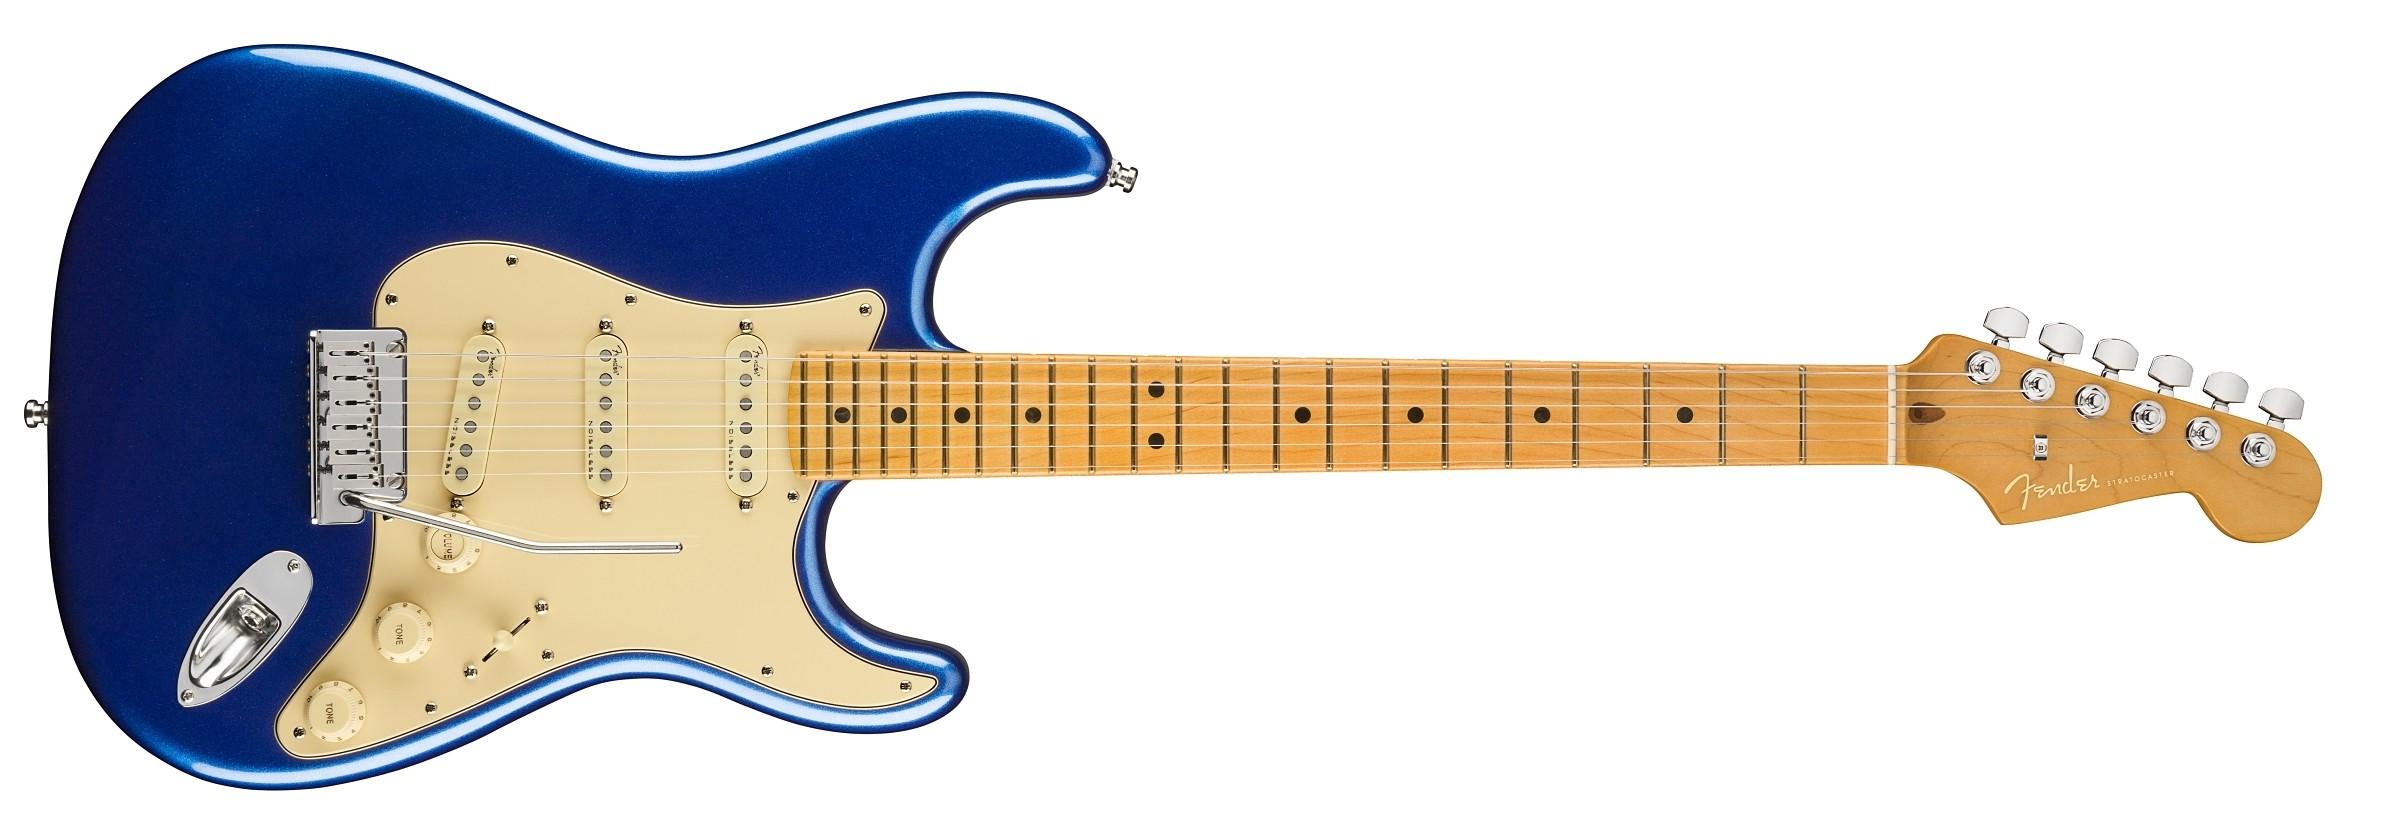 Fender American Ultra Stratocaster - Cobra Blue - Maple